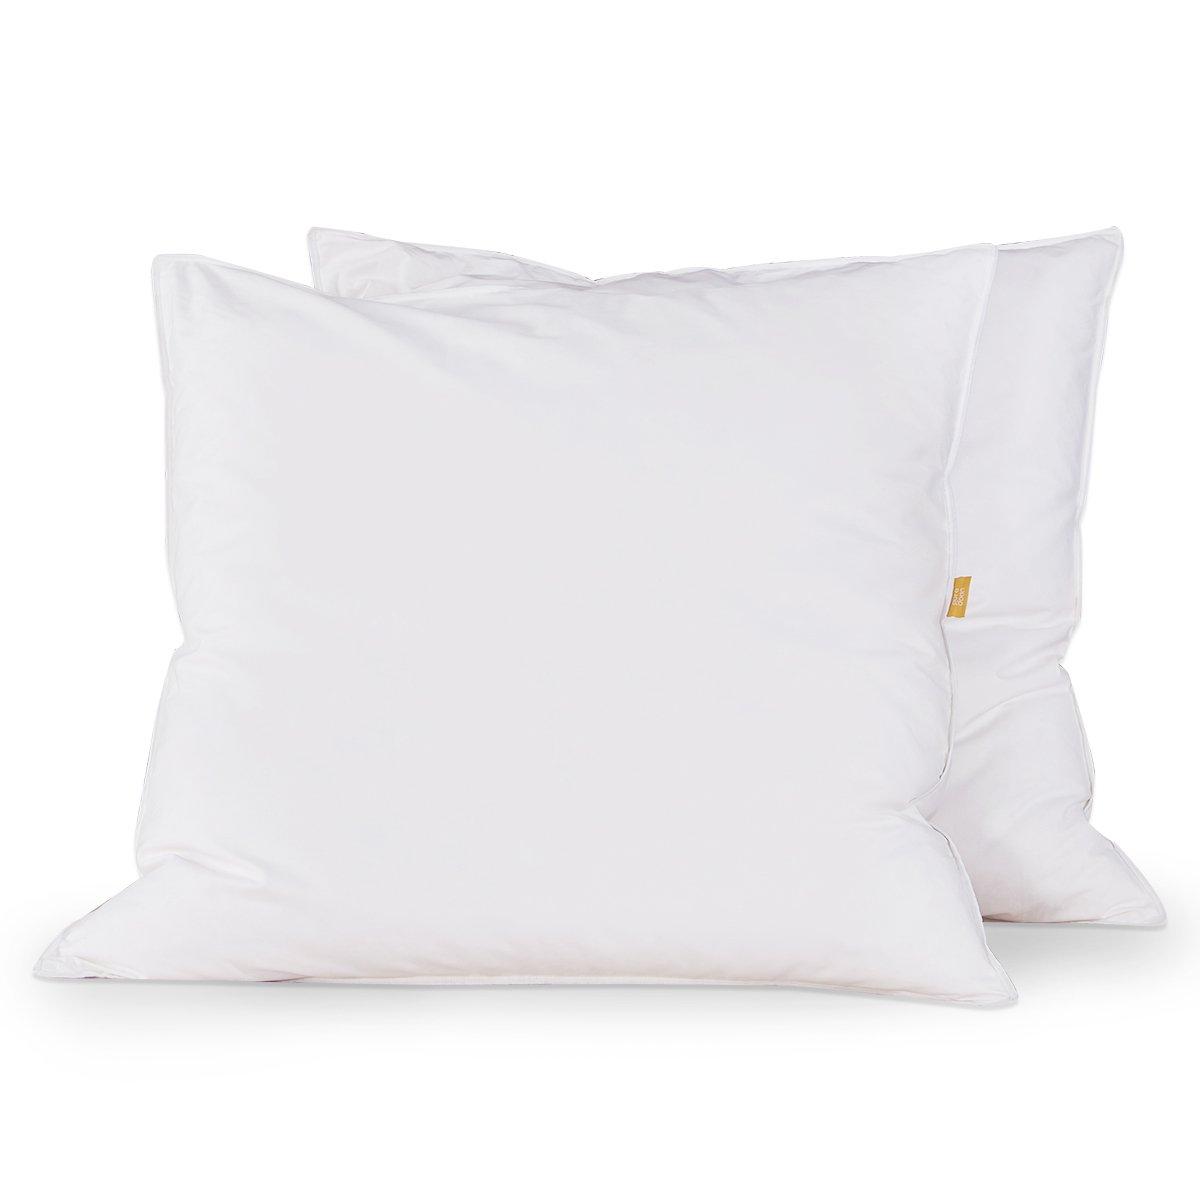 daunen kopfkissen 80x80 test wo entsorgt man alte bettdecken ikea kleiderschr nke 2015. Black Bedroom Furniture Sets. Home Design Ideas